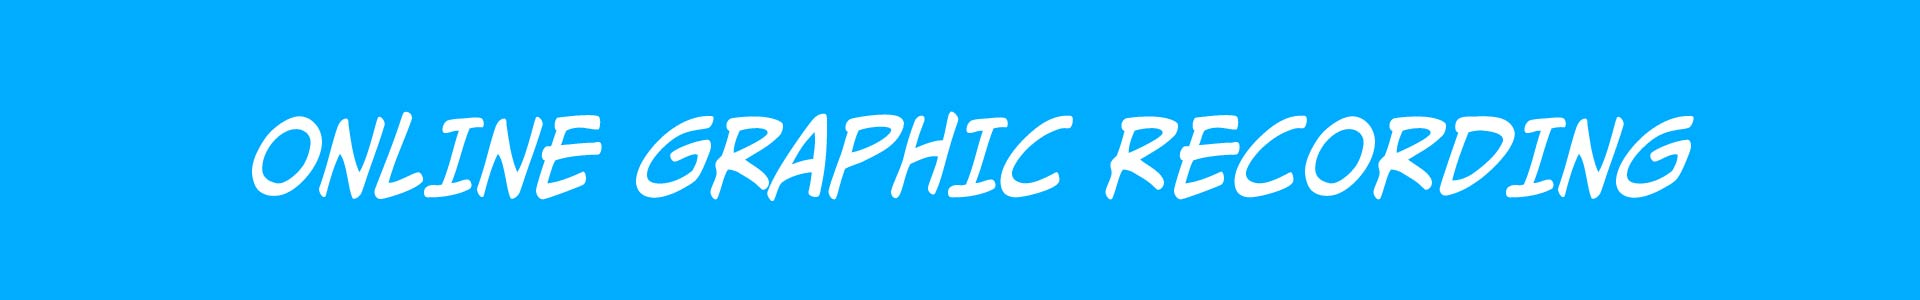 Banner Online Graphic Recording